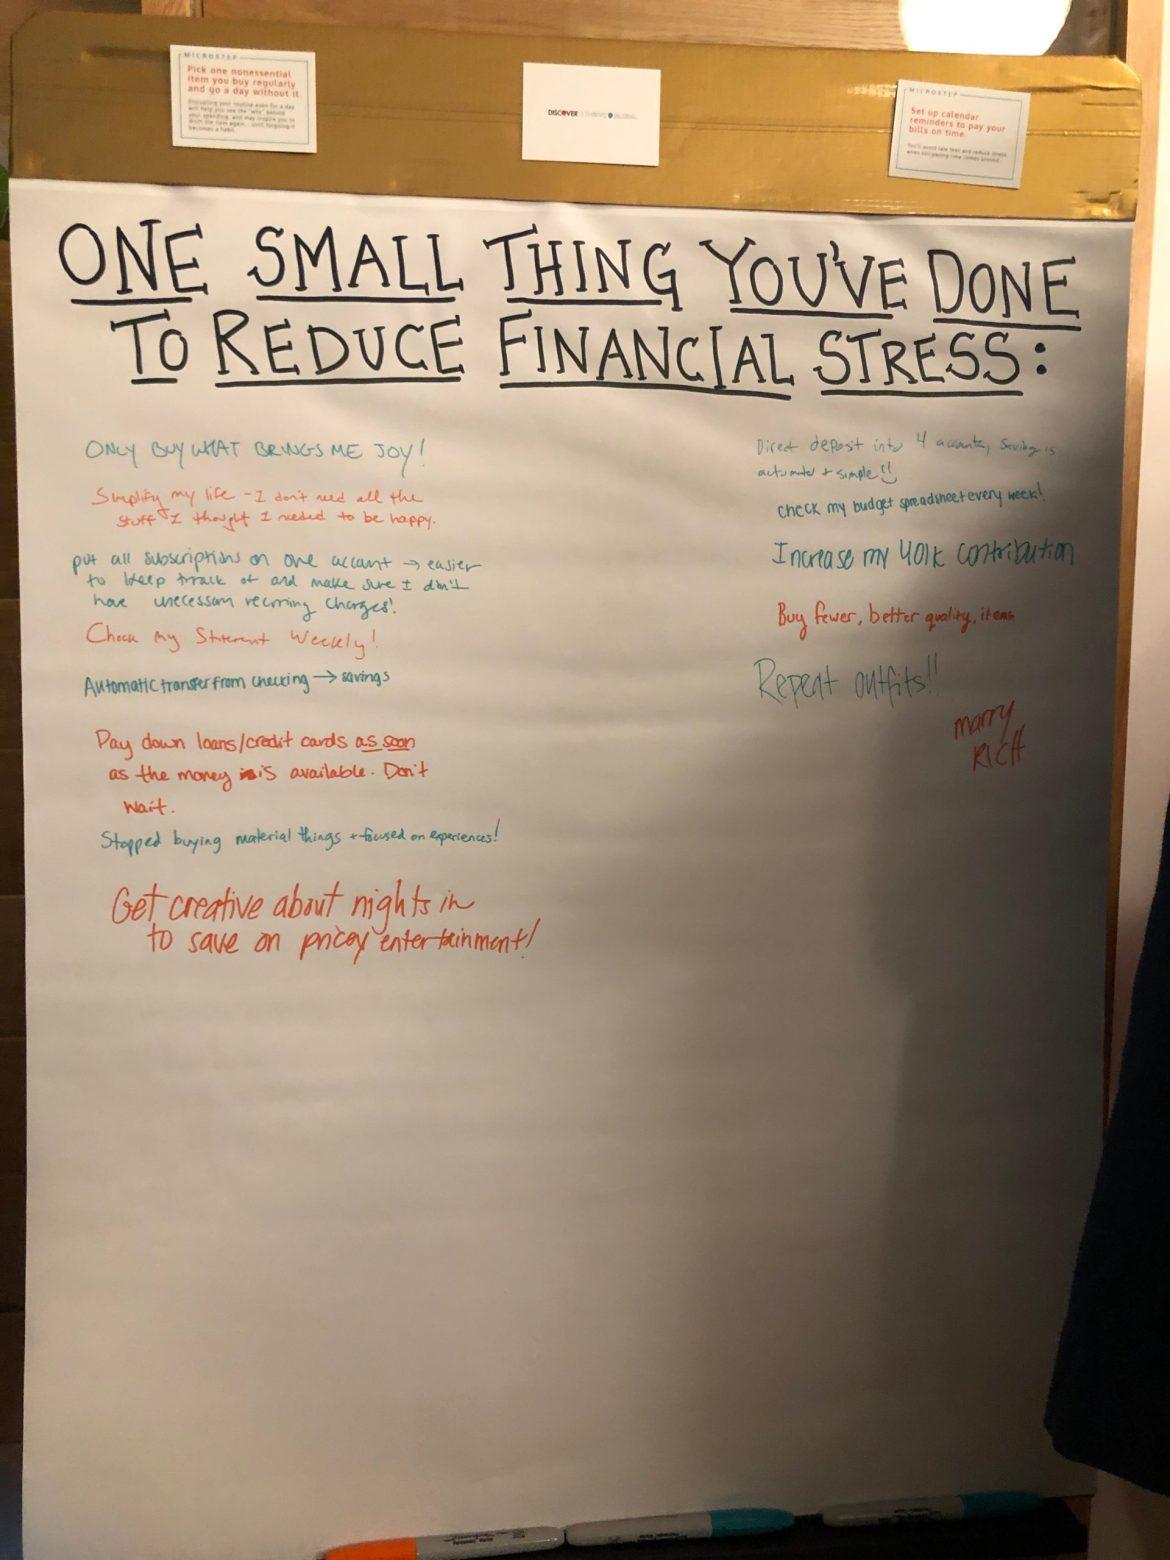 How do you manage financial stress?